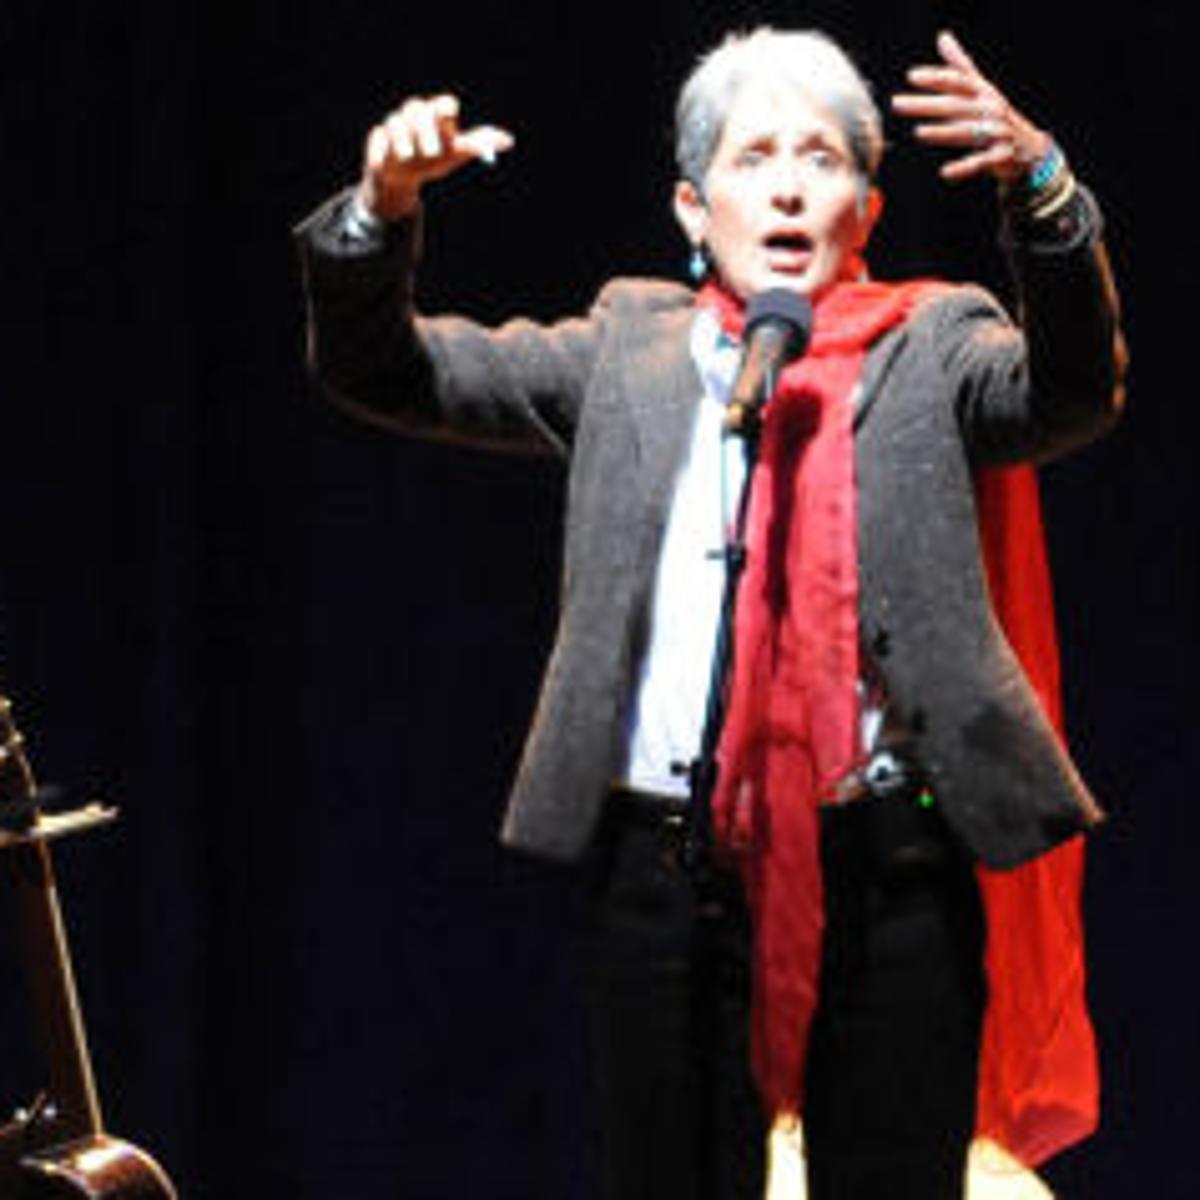 Folk Legend Joan Baez Returns To Big Sur For Esalen S 50th Anniversary Celebration Music Montereycountyweekly Com